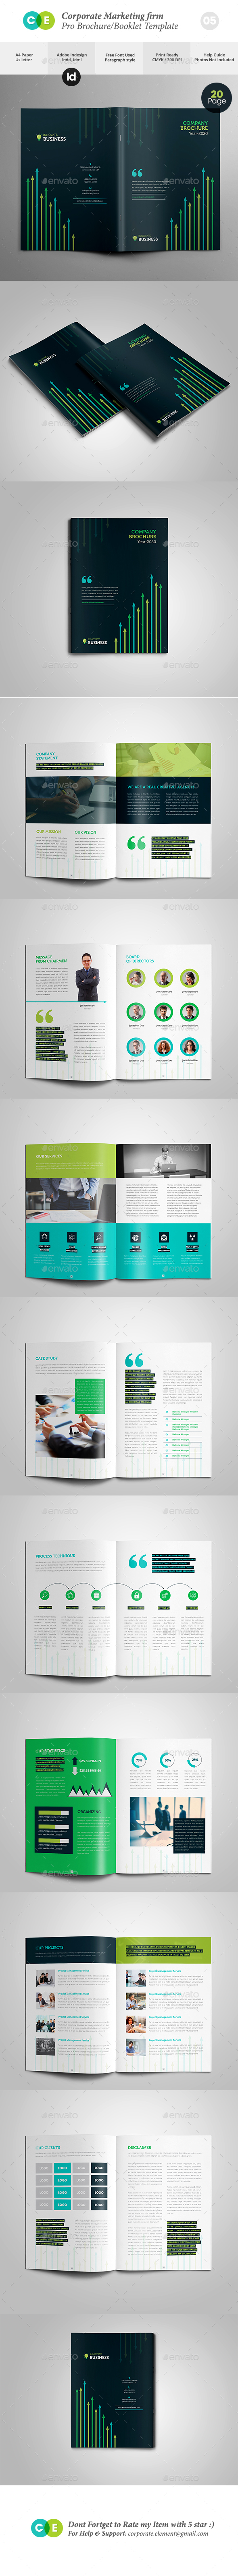 Corporate Marketing Firm Pro Brochure Template V05 - Brochures Print Templates